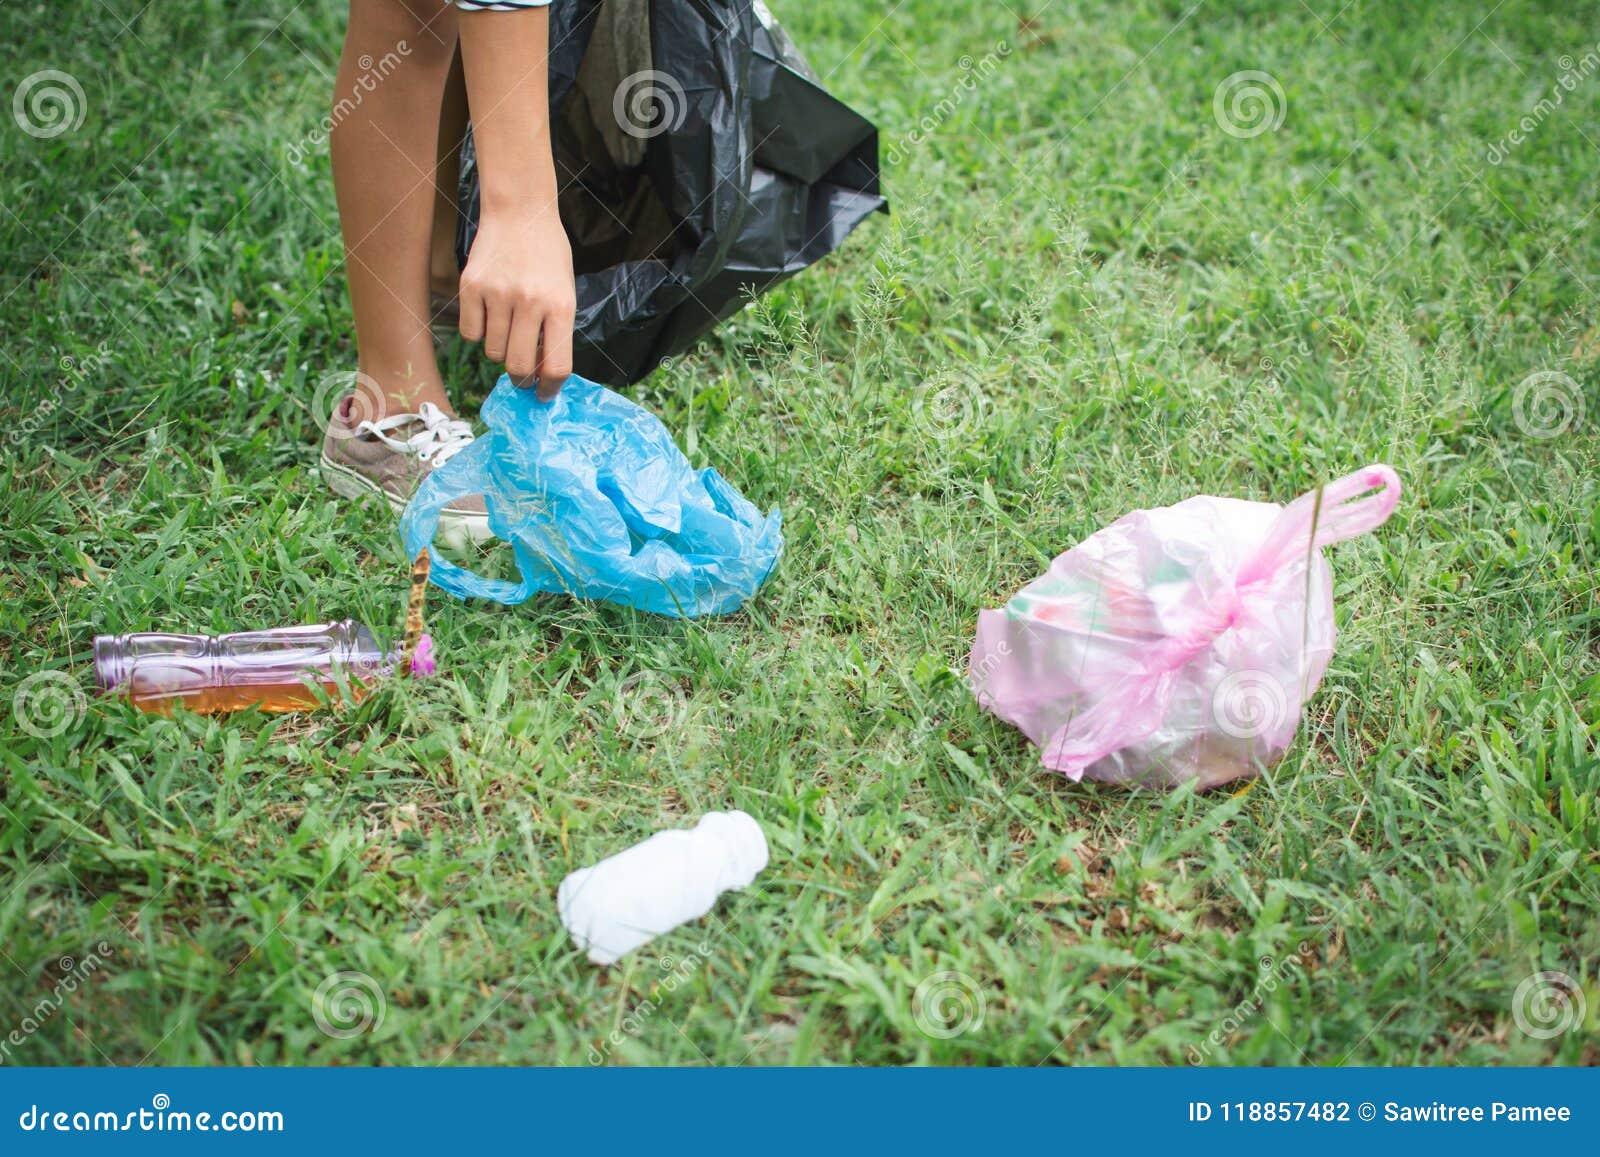 Human Hand Picking Up Plastic Into Bin Bag On Park Stock Photo